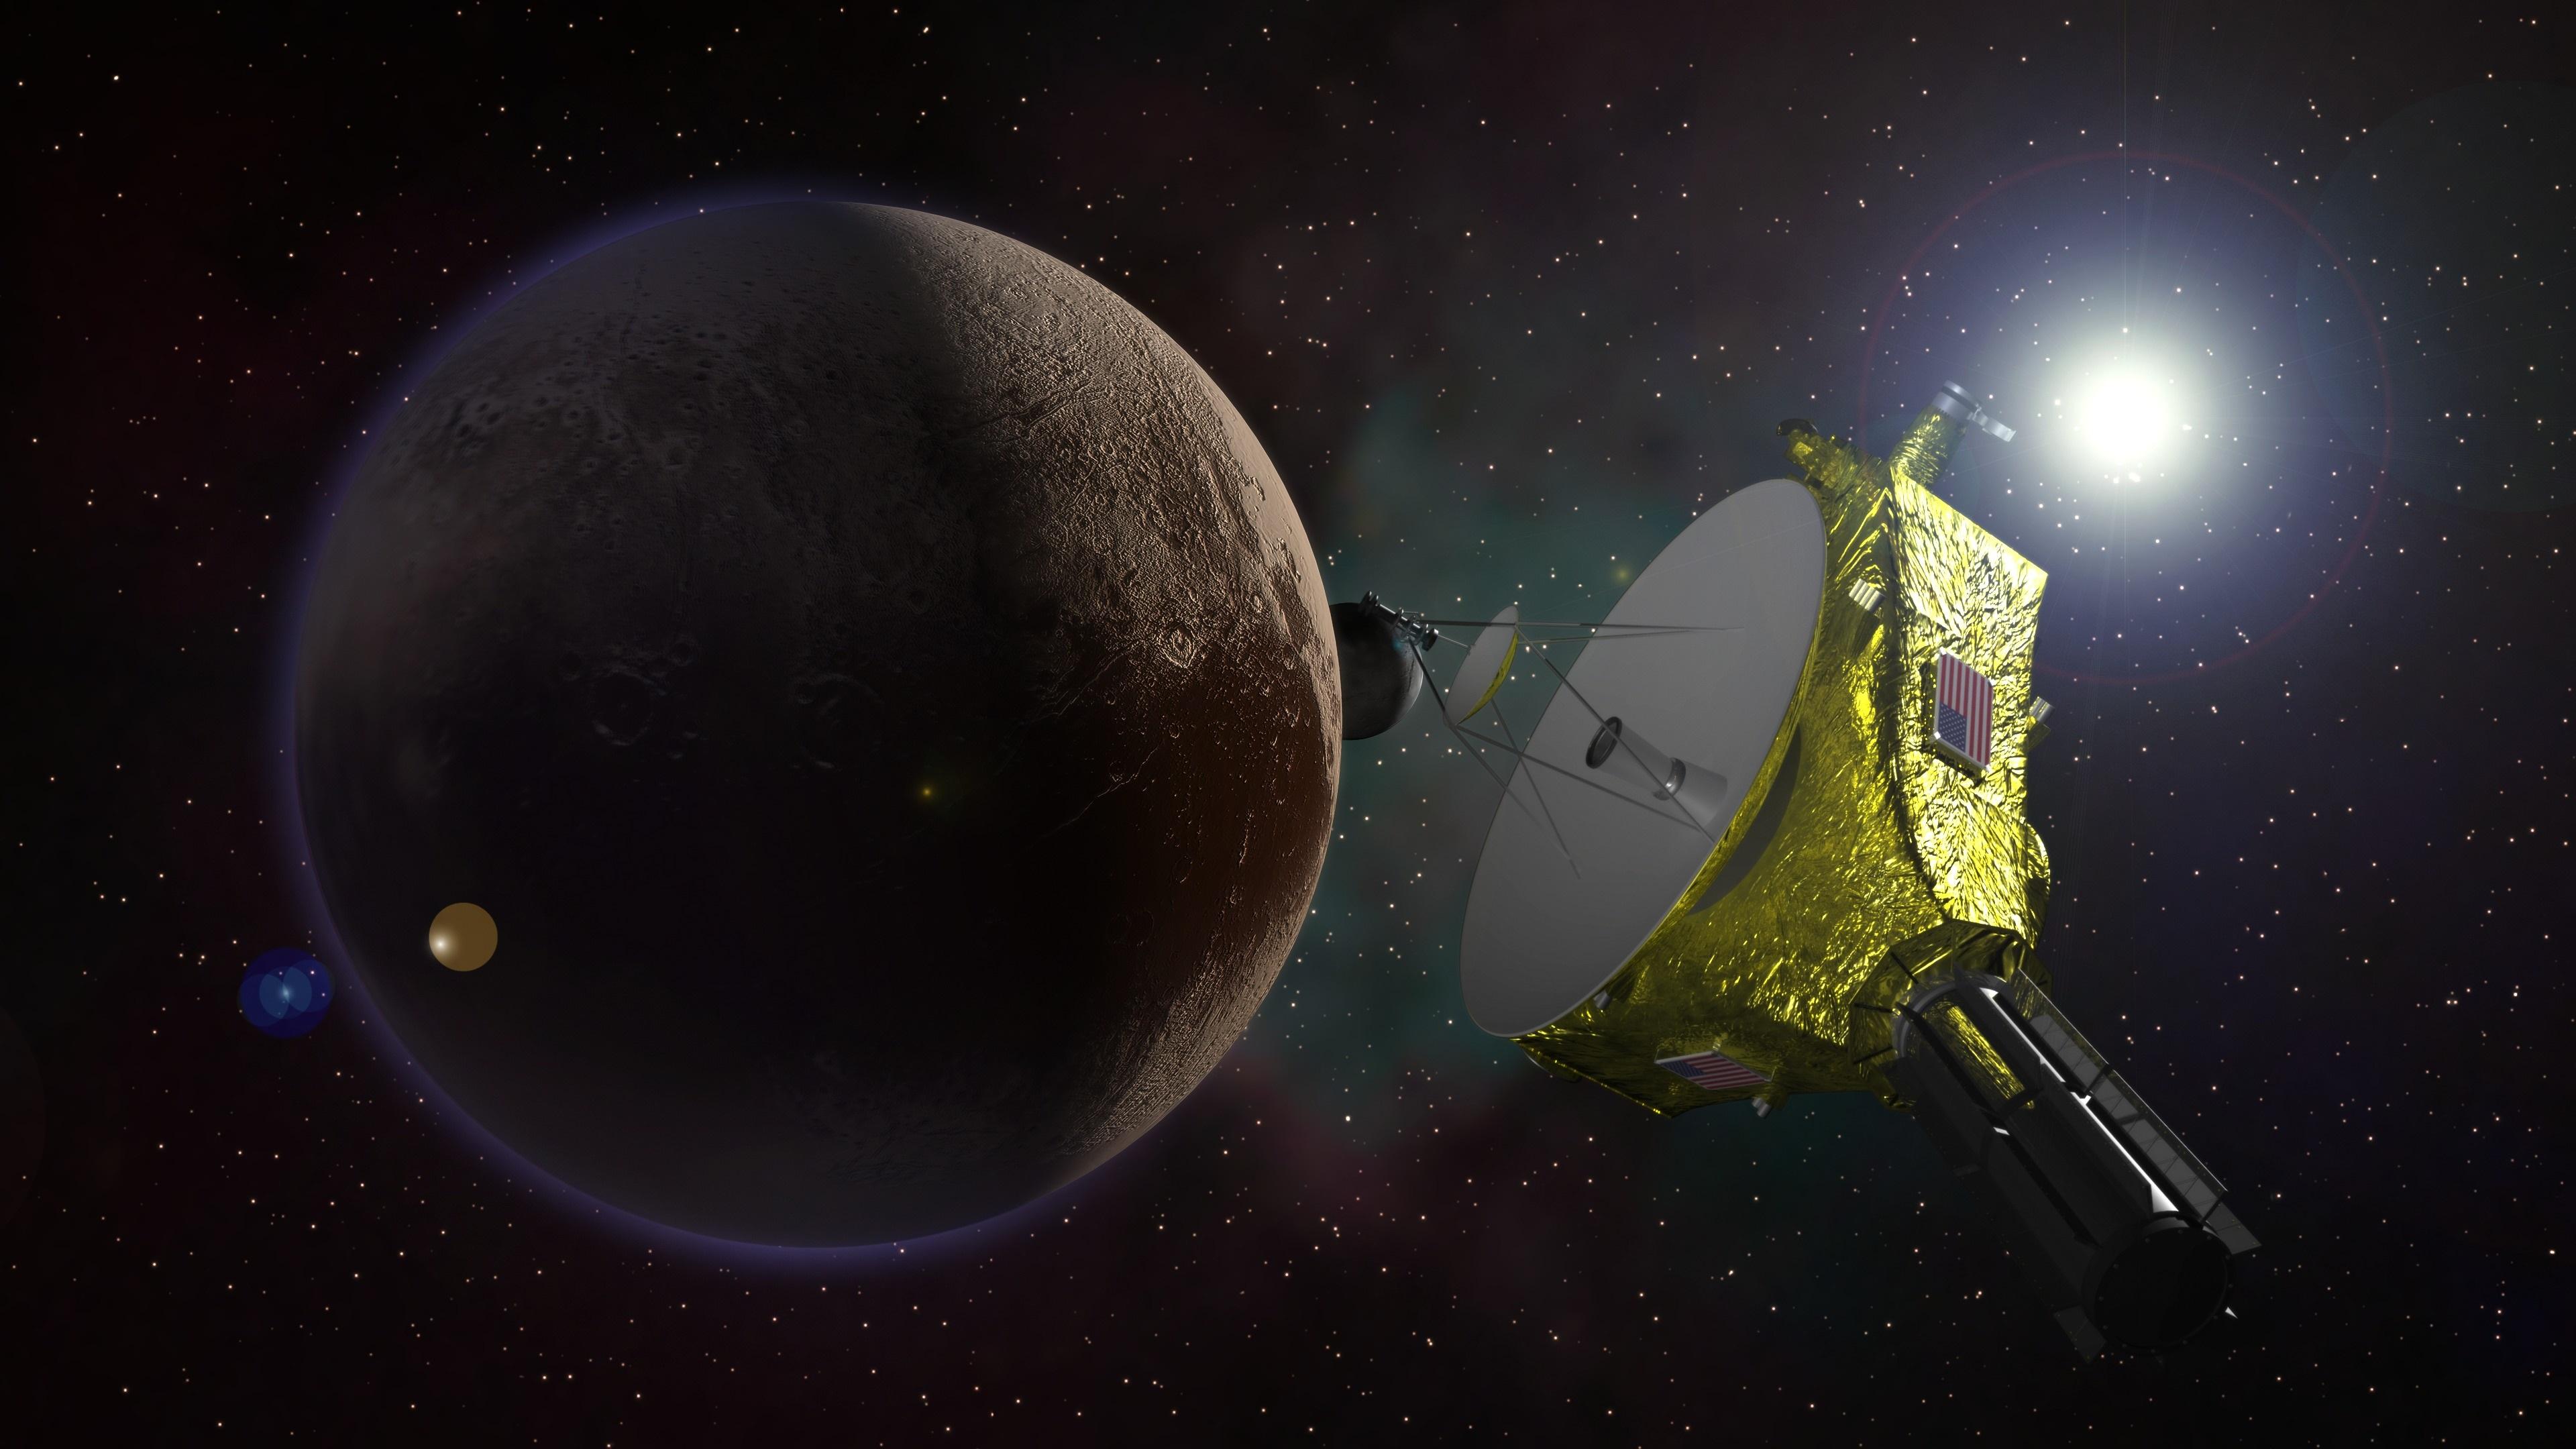 Wallpaper Pluto Planet Interplanetary Station Nasa